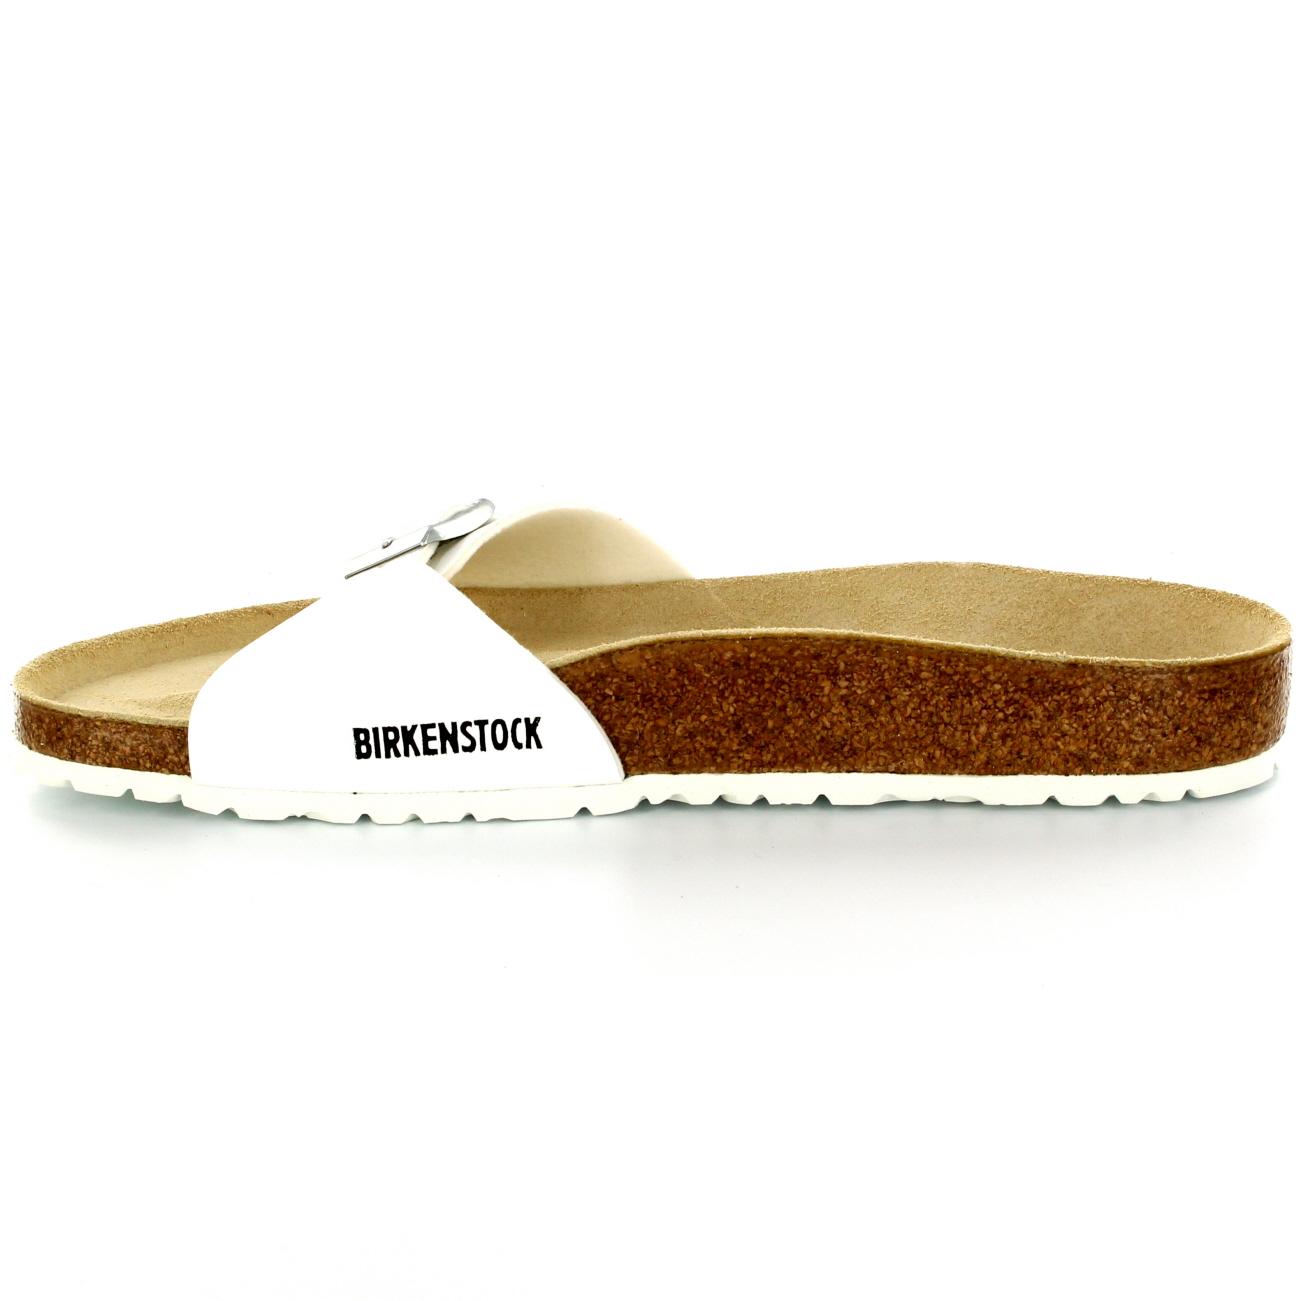 Unisex-Adults-Birkenstock-Madrid-Casual-Birko-Flor-Beach-Summer-Sandals-UK-2-13 thumbnail 15